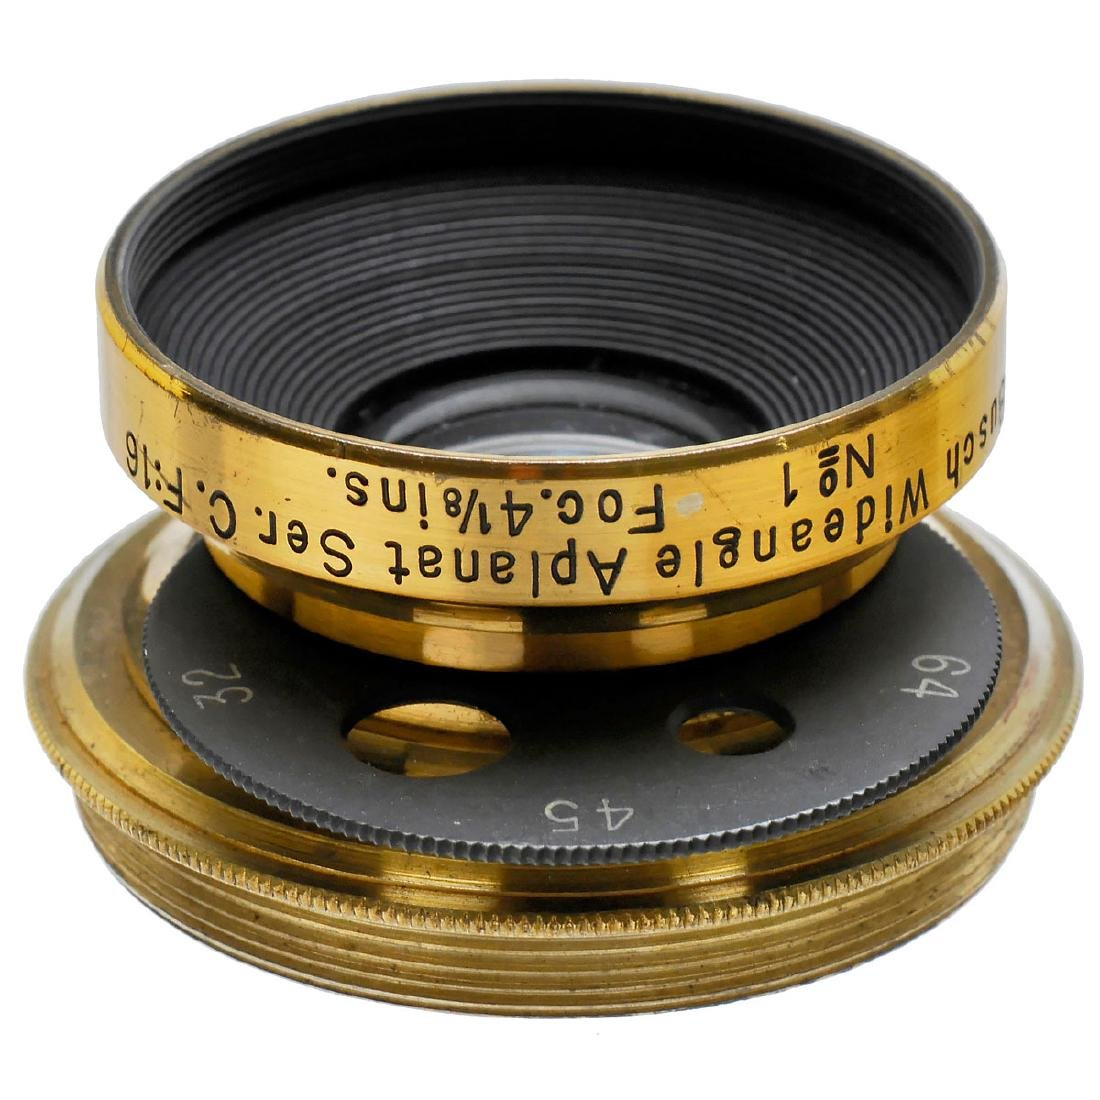 Busch Wideangle Aplanat Lens Ser. C. F:16 No. 1 Foc.